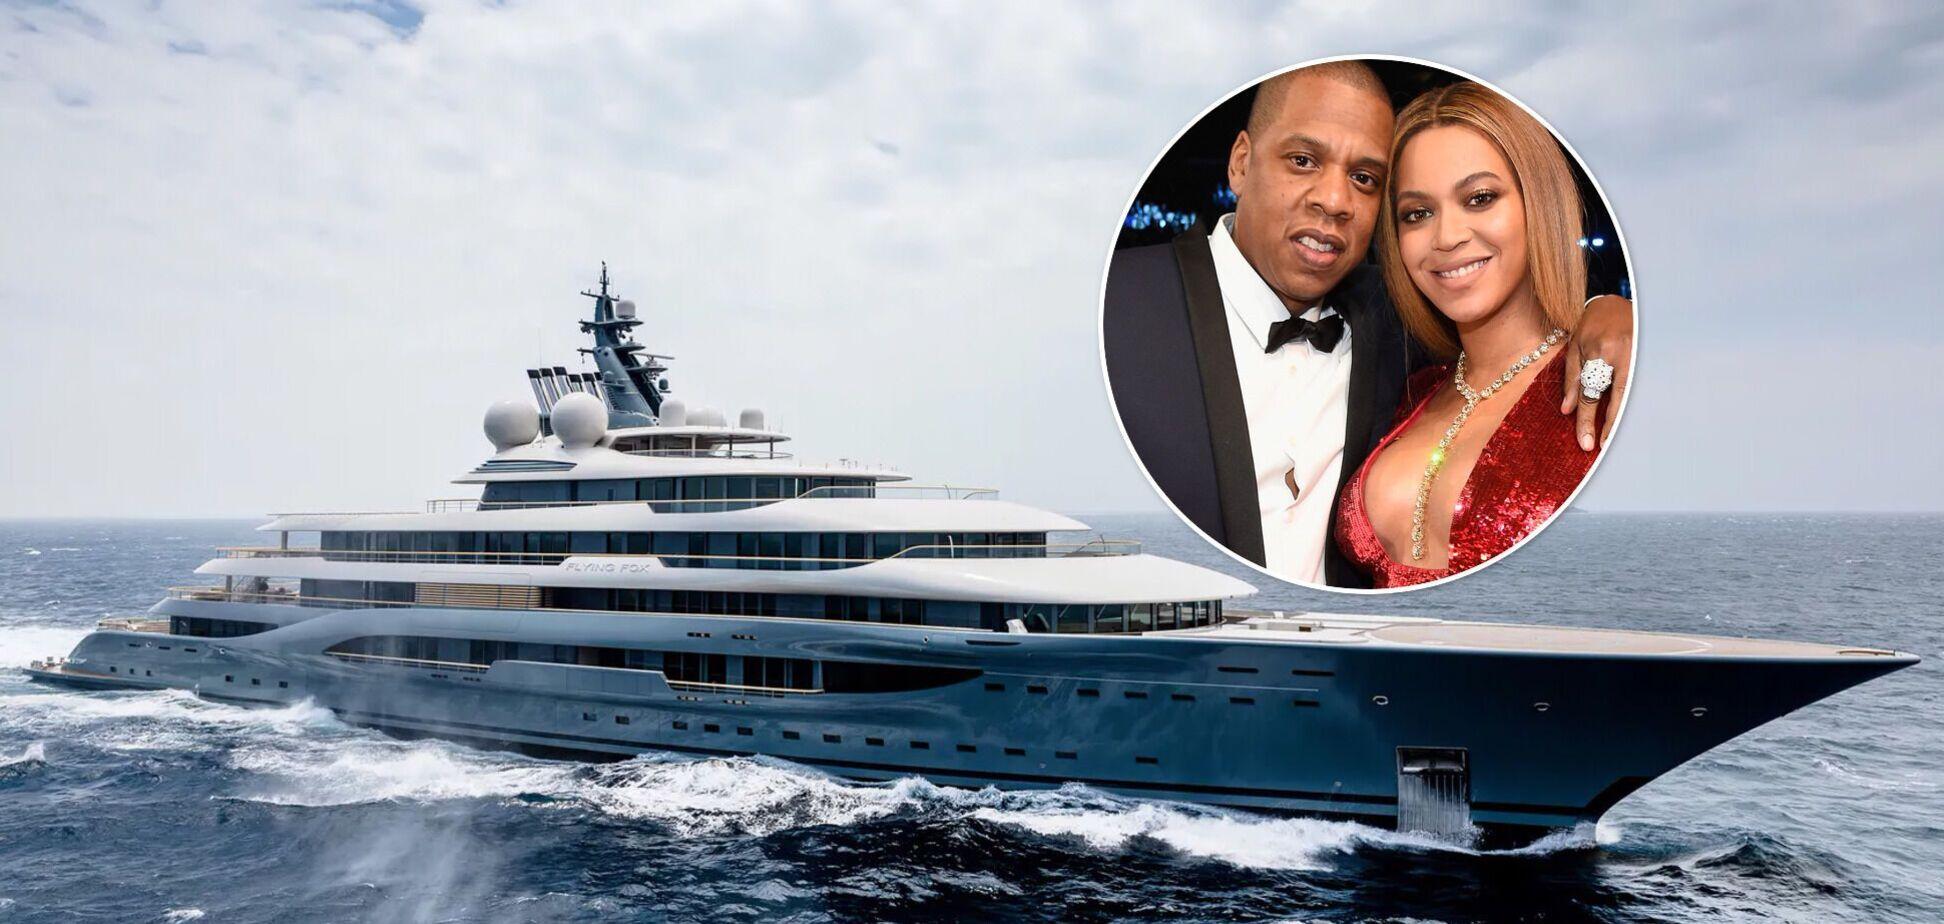 Бейонсе и Jay-Z отдыхают на яхте за 3 млрд евро: как она выглядит изнутри